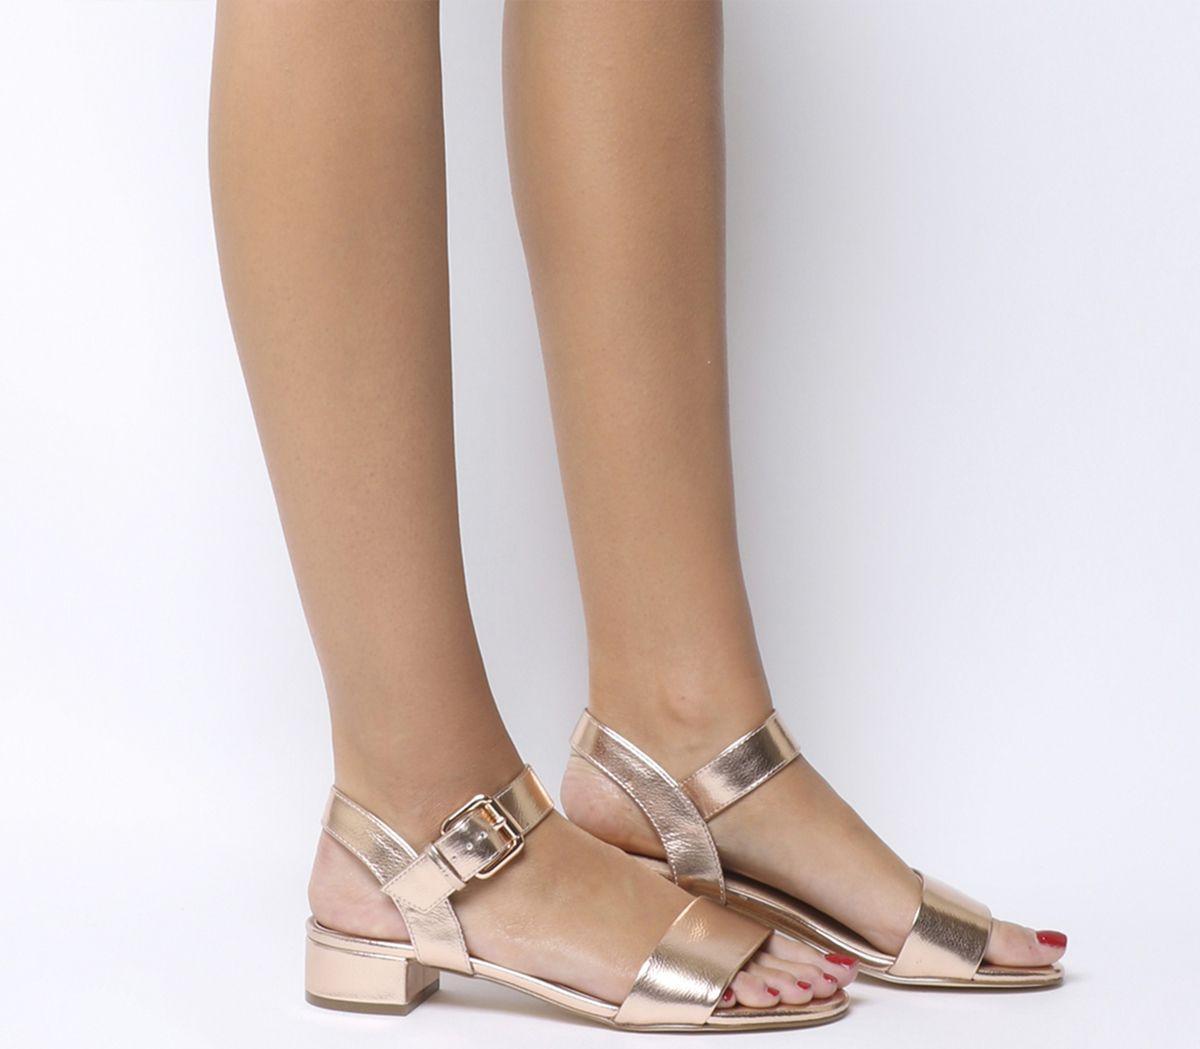 cbb6eaeae2d Office Morgan Block Heel Sandals Rose Gold - Mid Heels